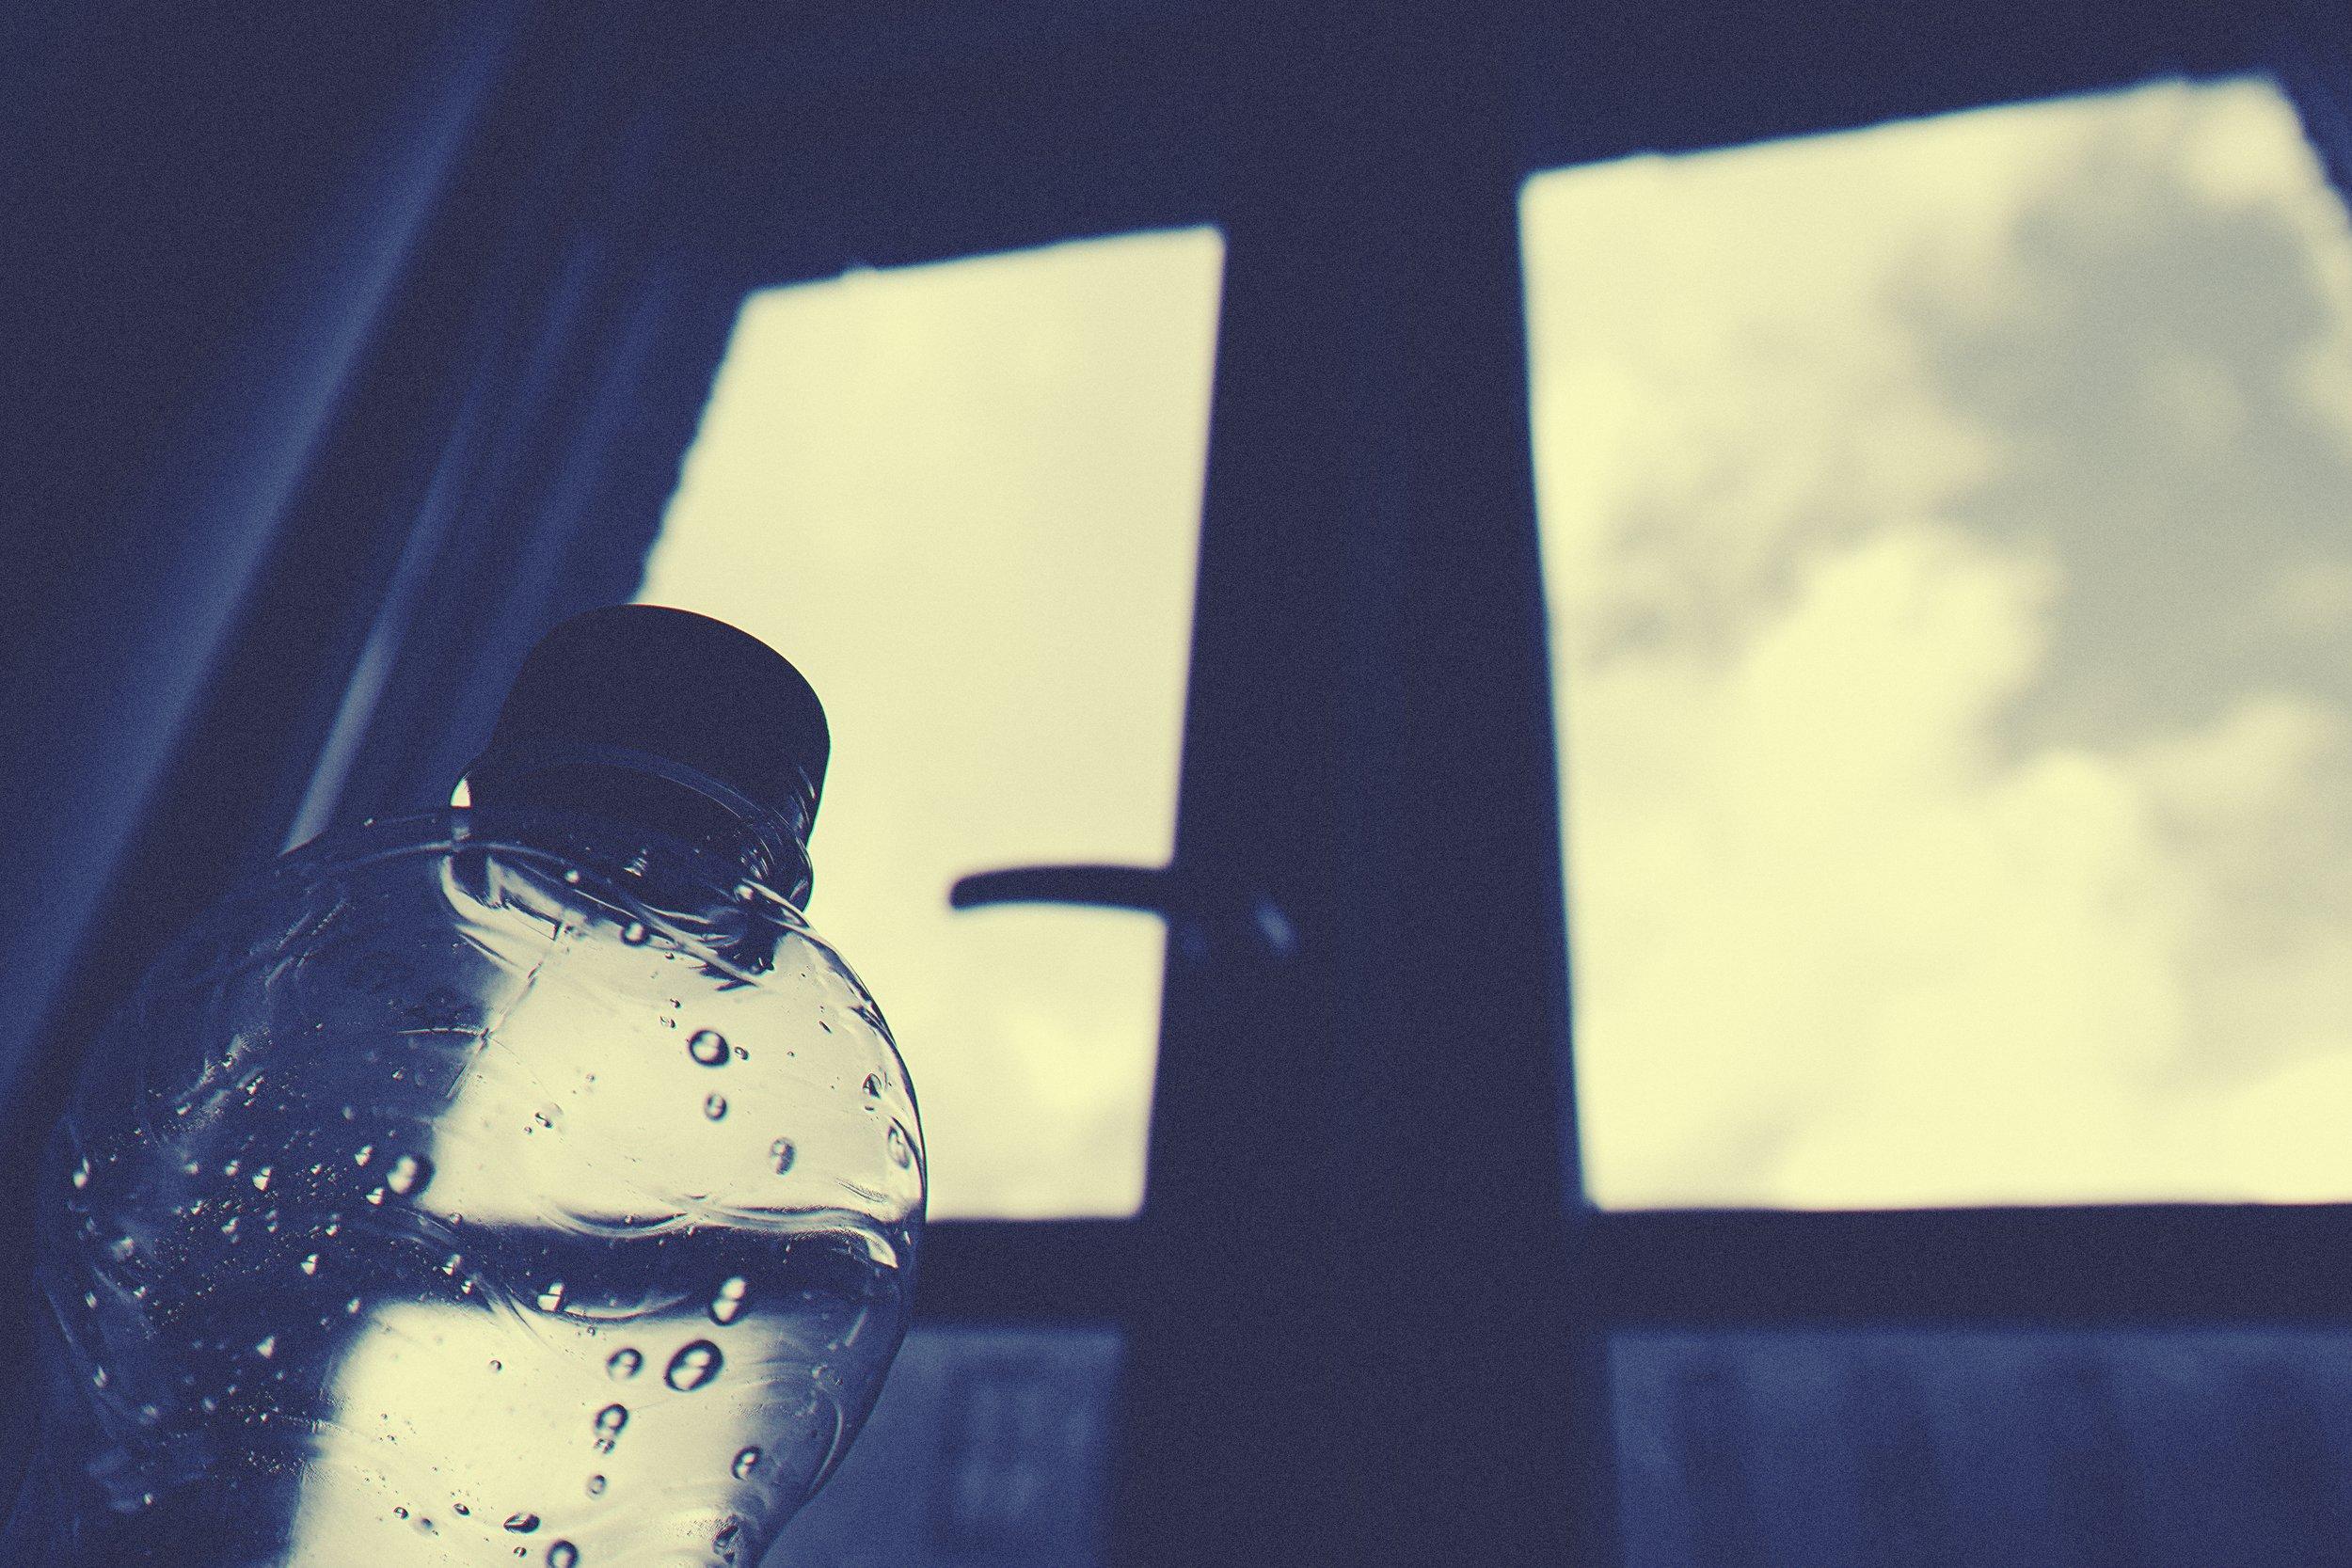 plastic-water-bottle-safety.jpeg